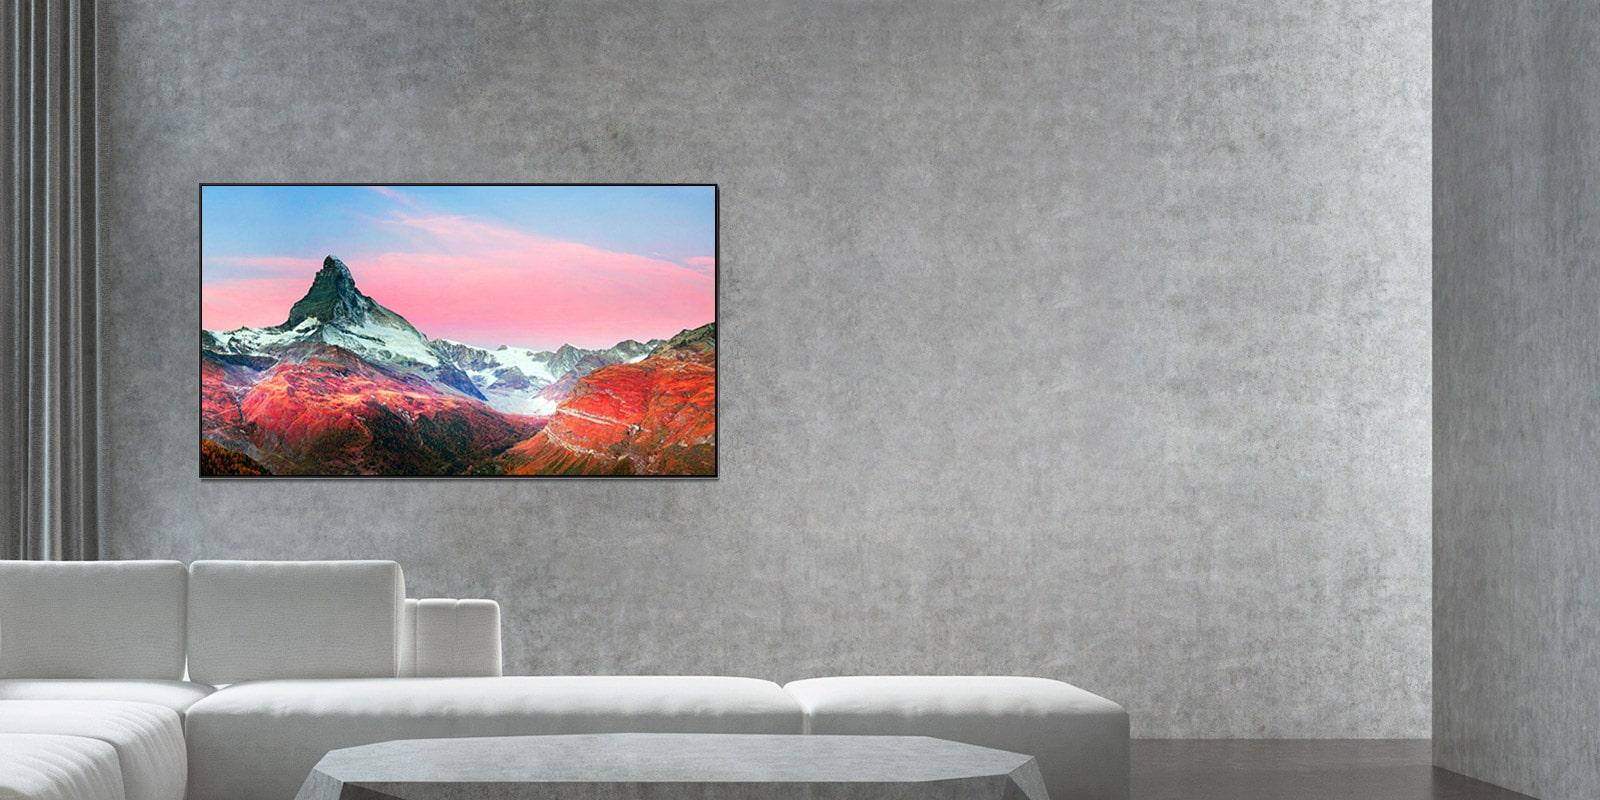 LG OLED TV Reliability1